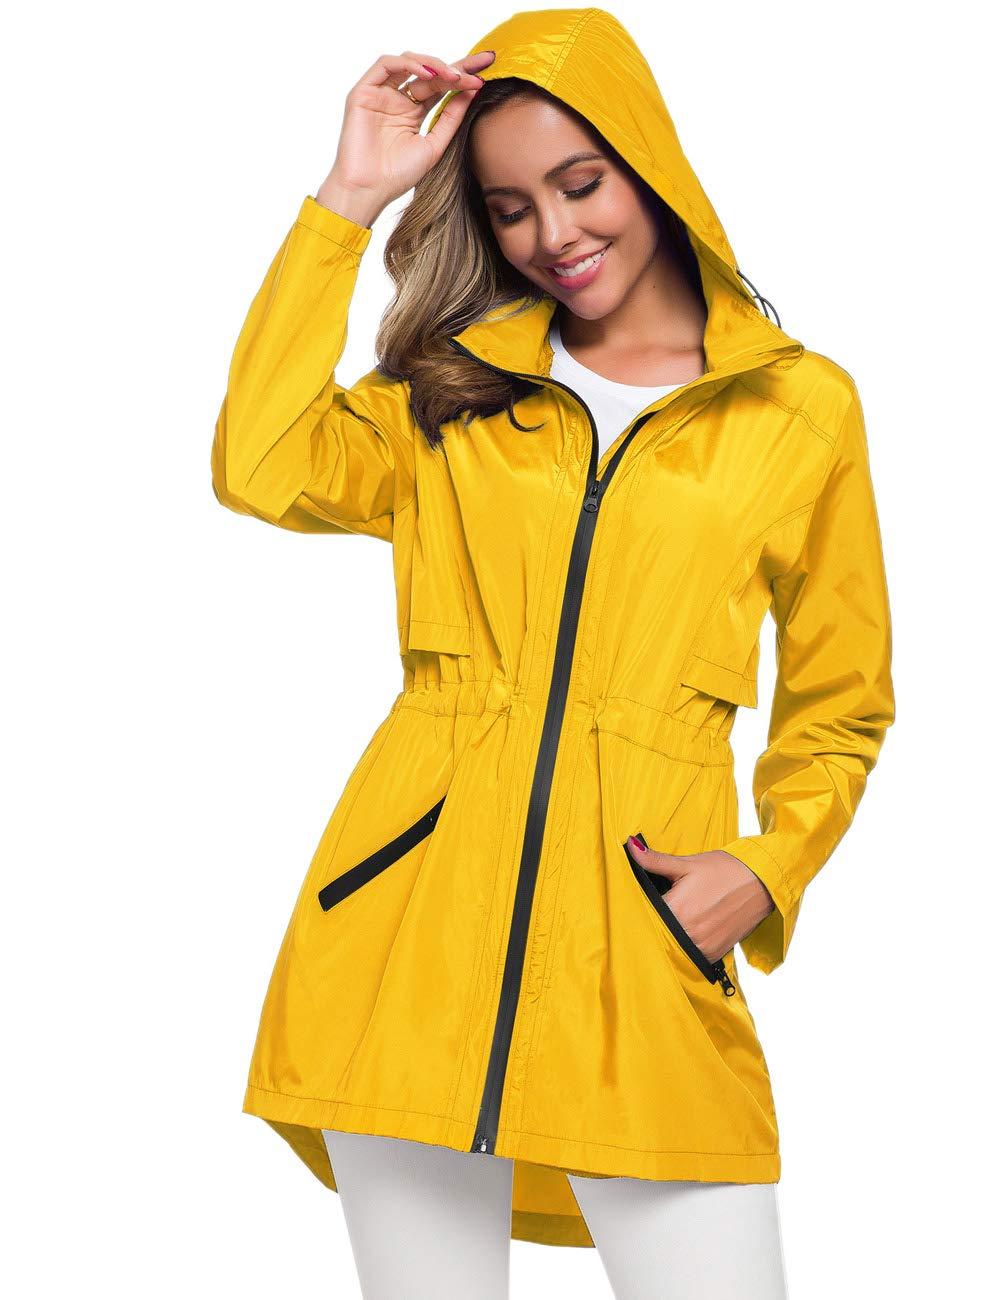 Avoogue Women's Long Raincoat with Hood Outdoor Lightweight Windbreaker Rain Jacket Waterproof